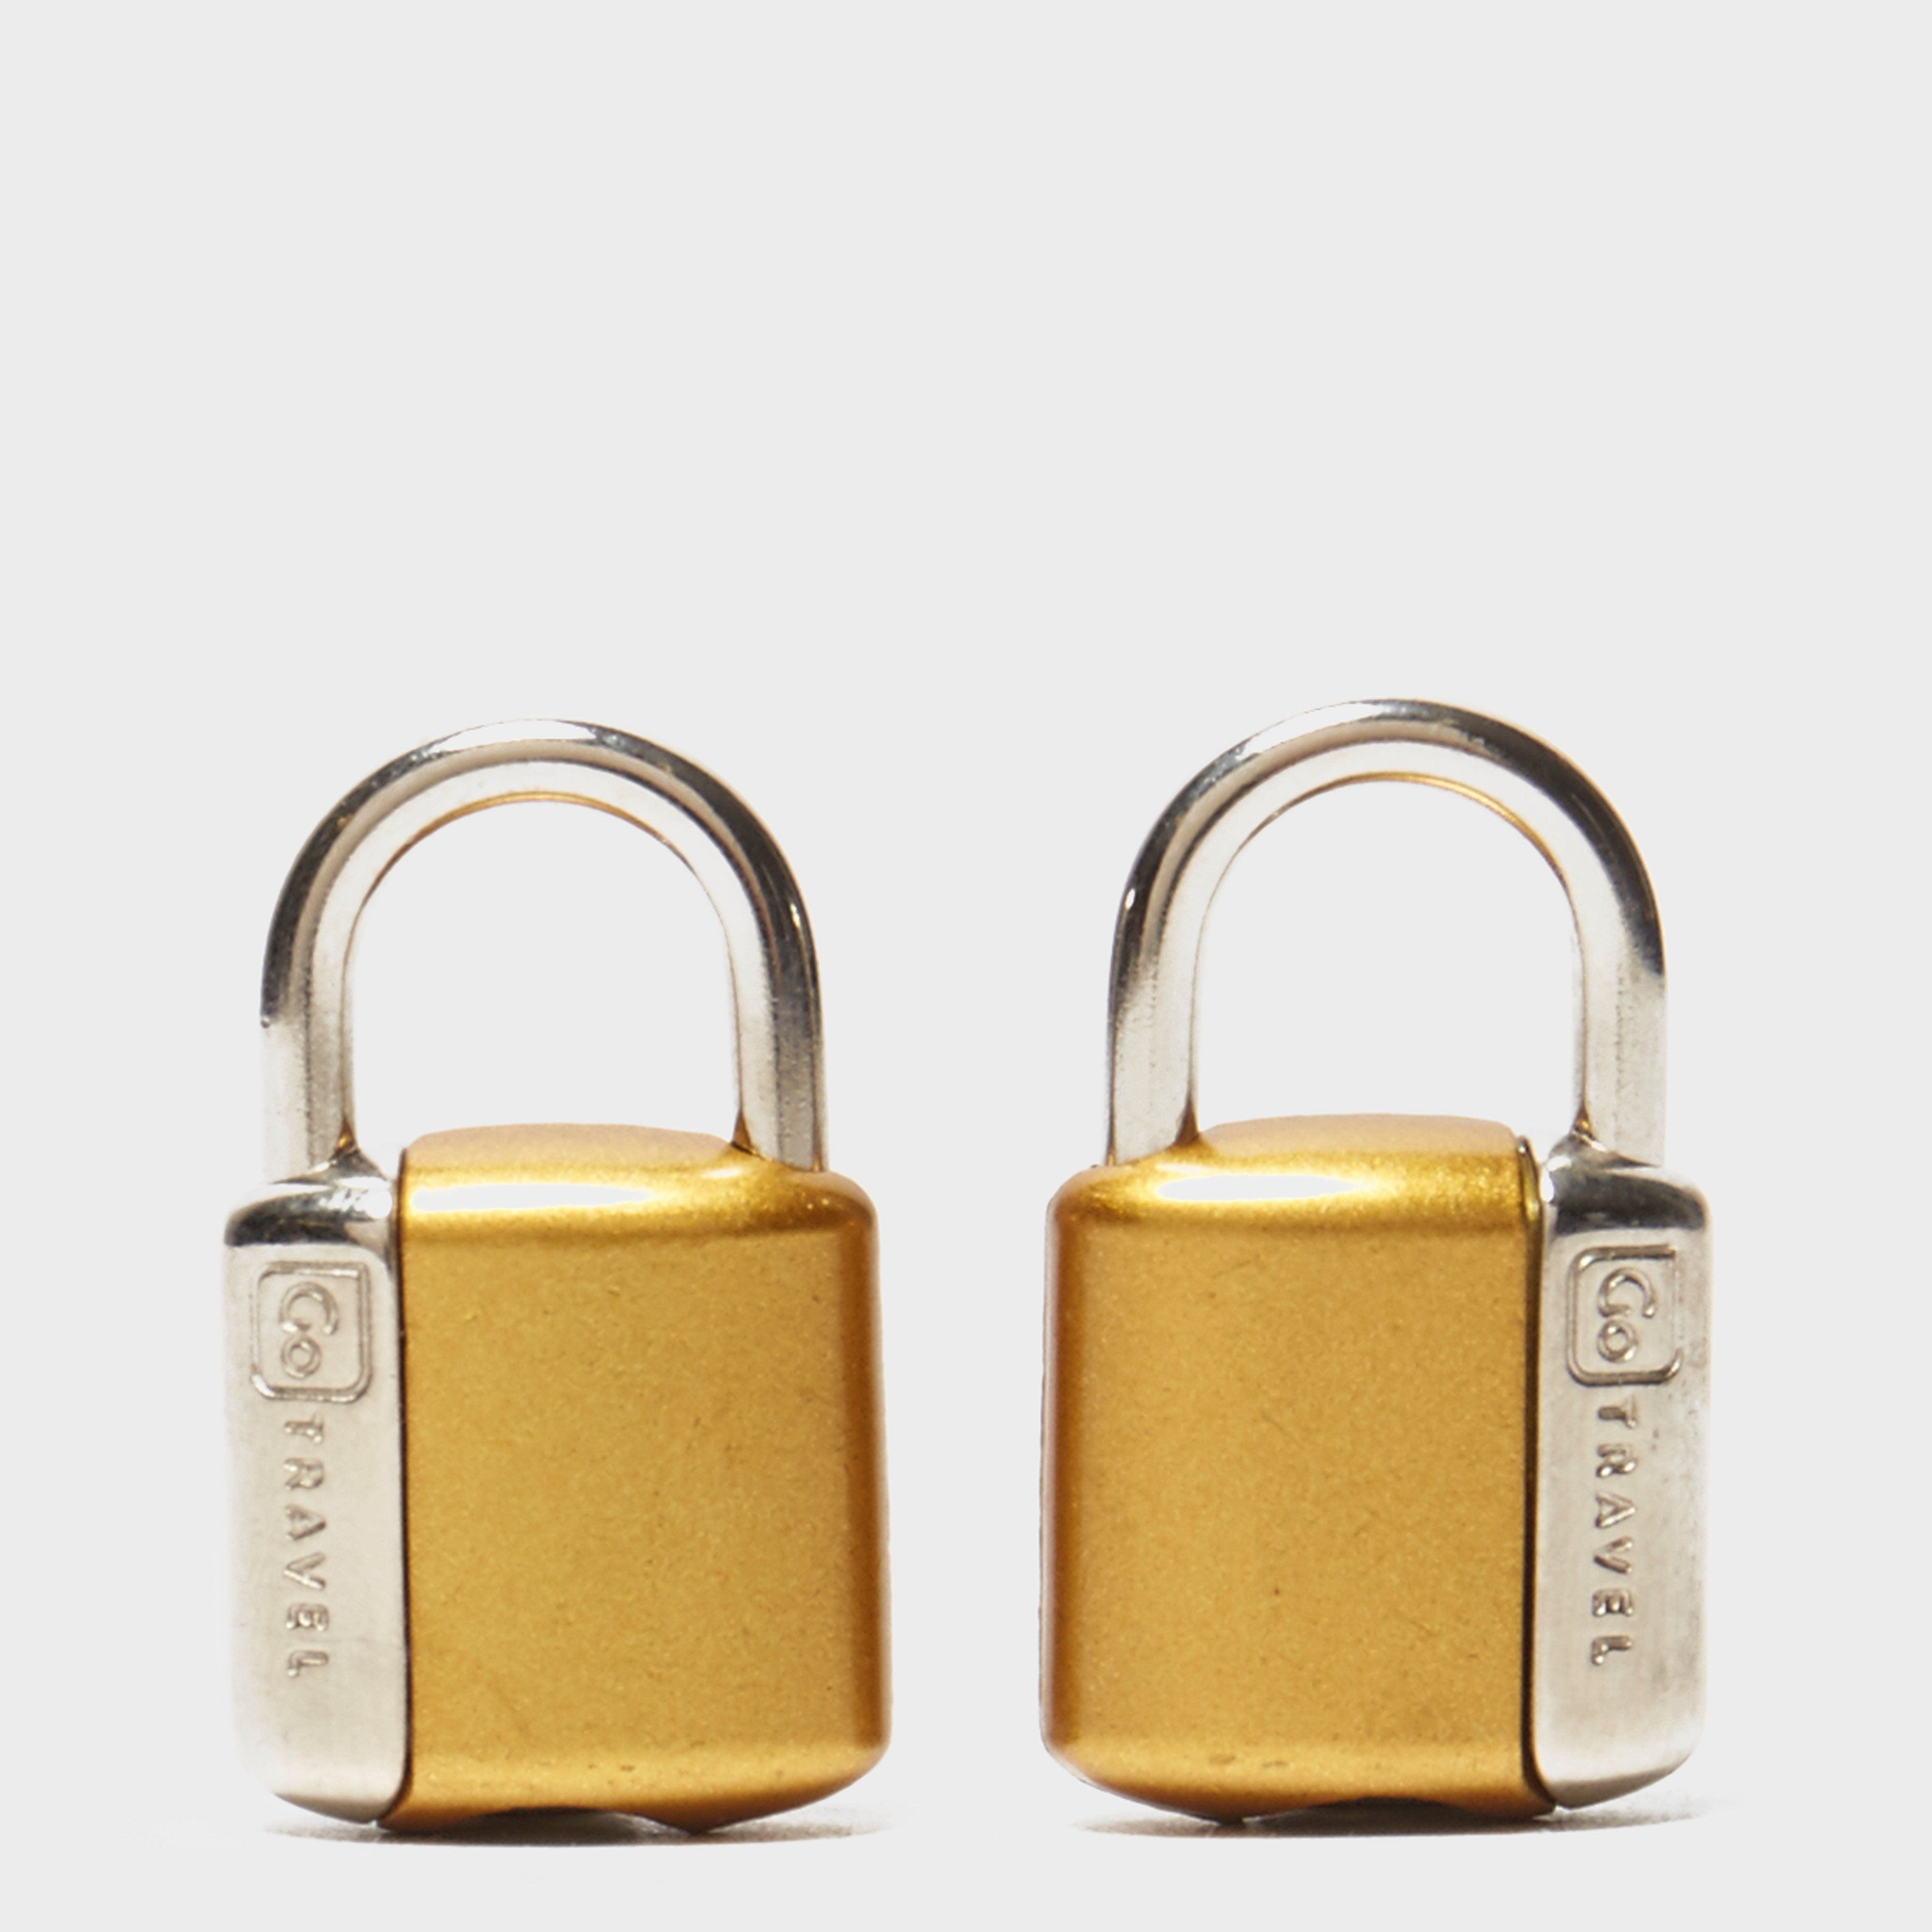 DESIGN GO Twin Pack Case Lock